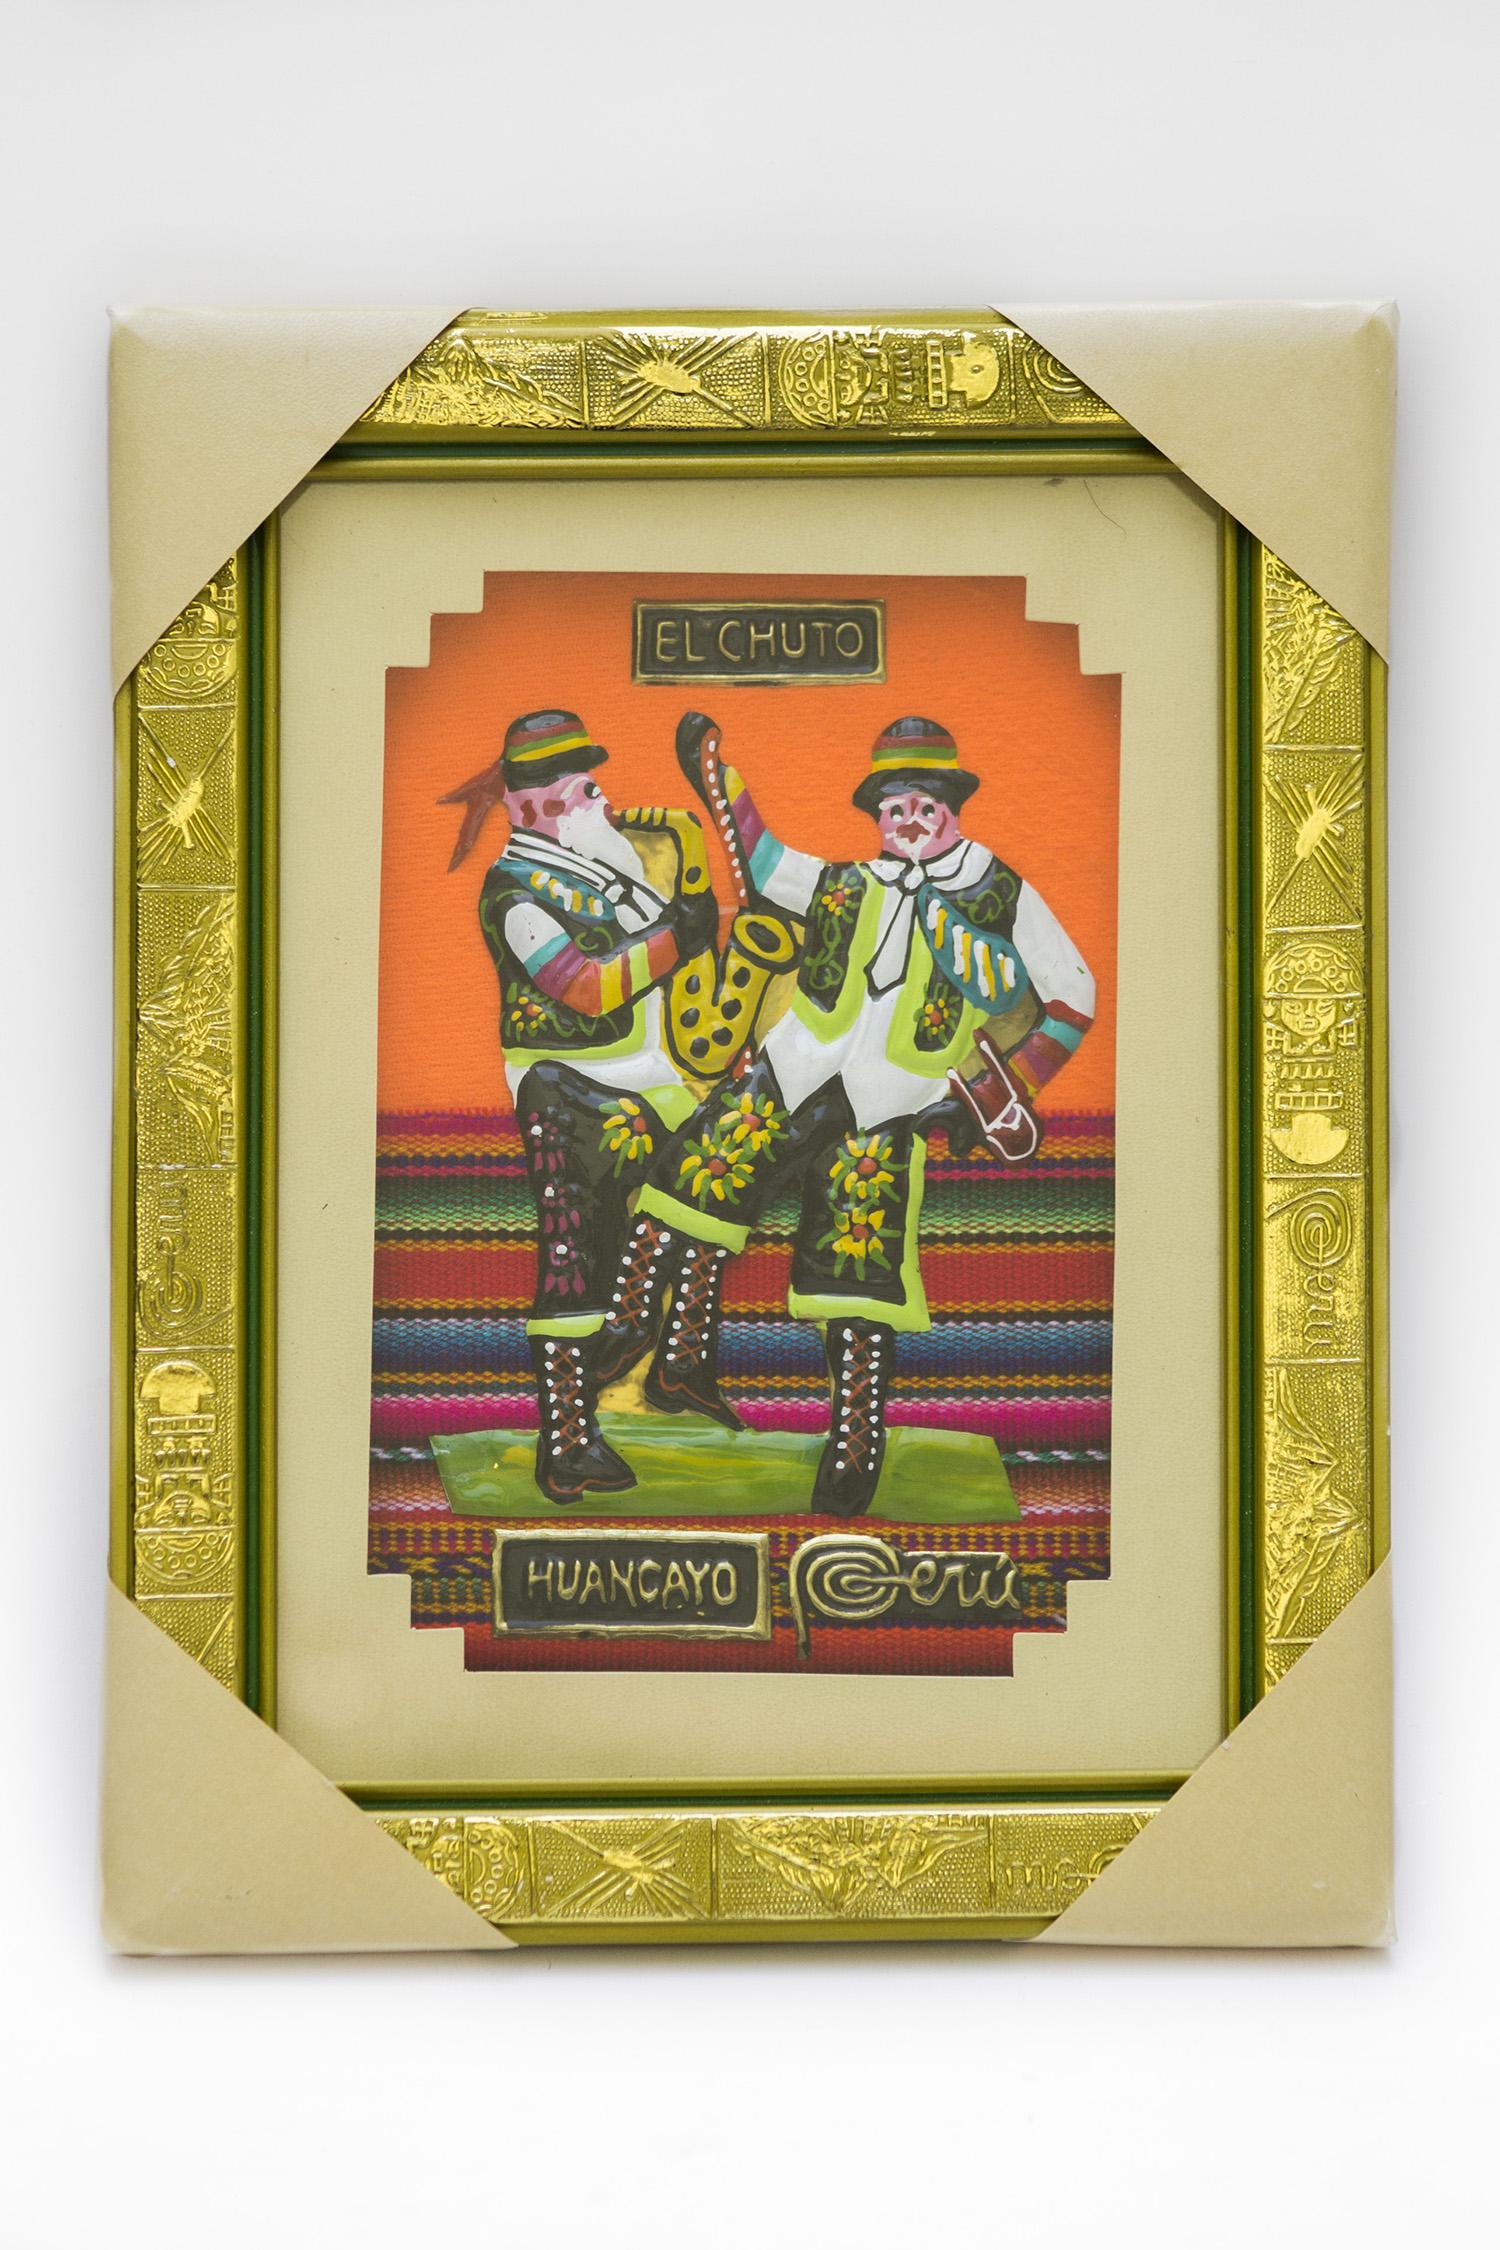 Framed Chuto Peruvian Decor – Buy and Sell Marketplace   Lokal ...